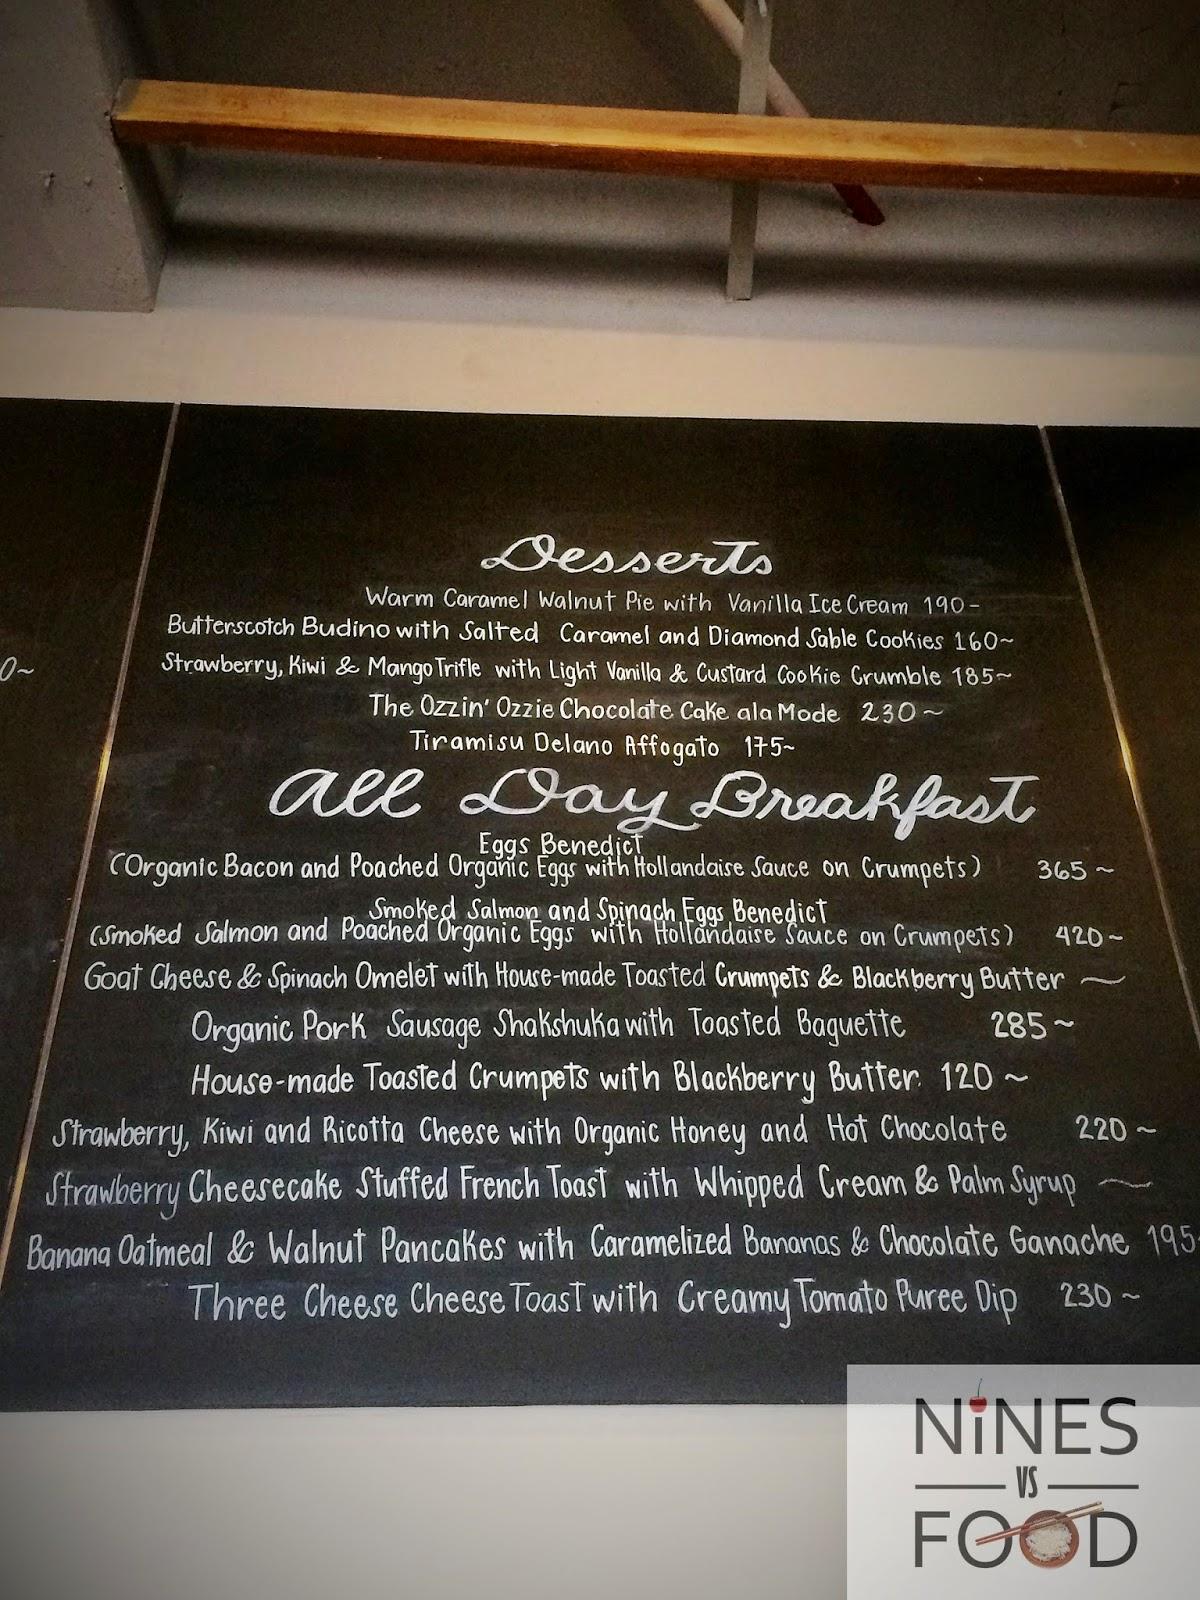 Nines vs. Food - Potts Point Cafe Eastwood-25.jpg